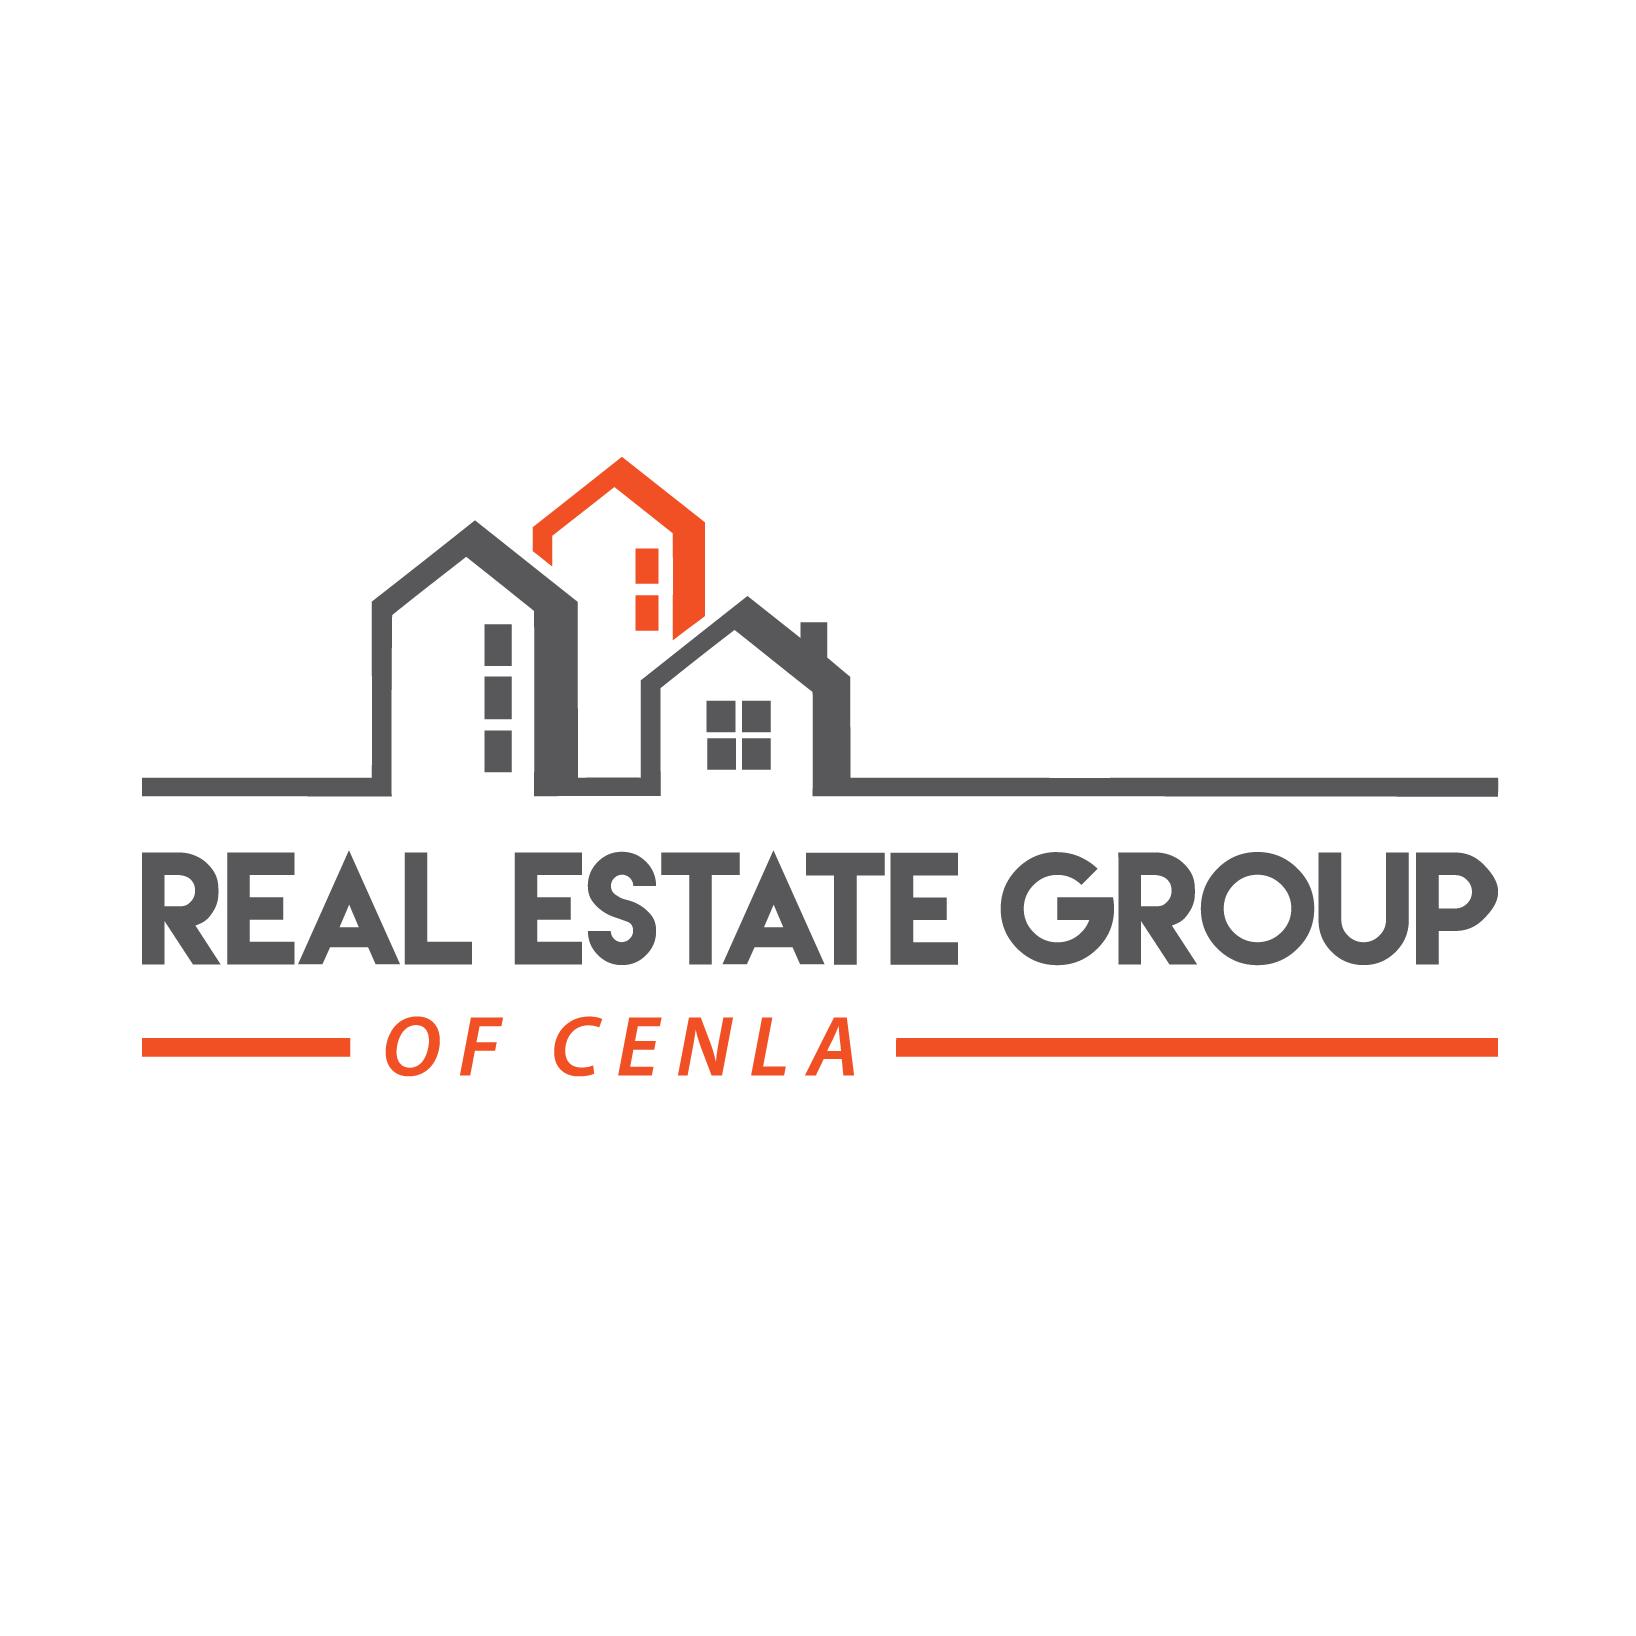 Real Estate Group of CenlaReal Estate Group of Cenla